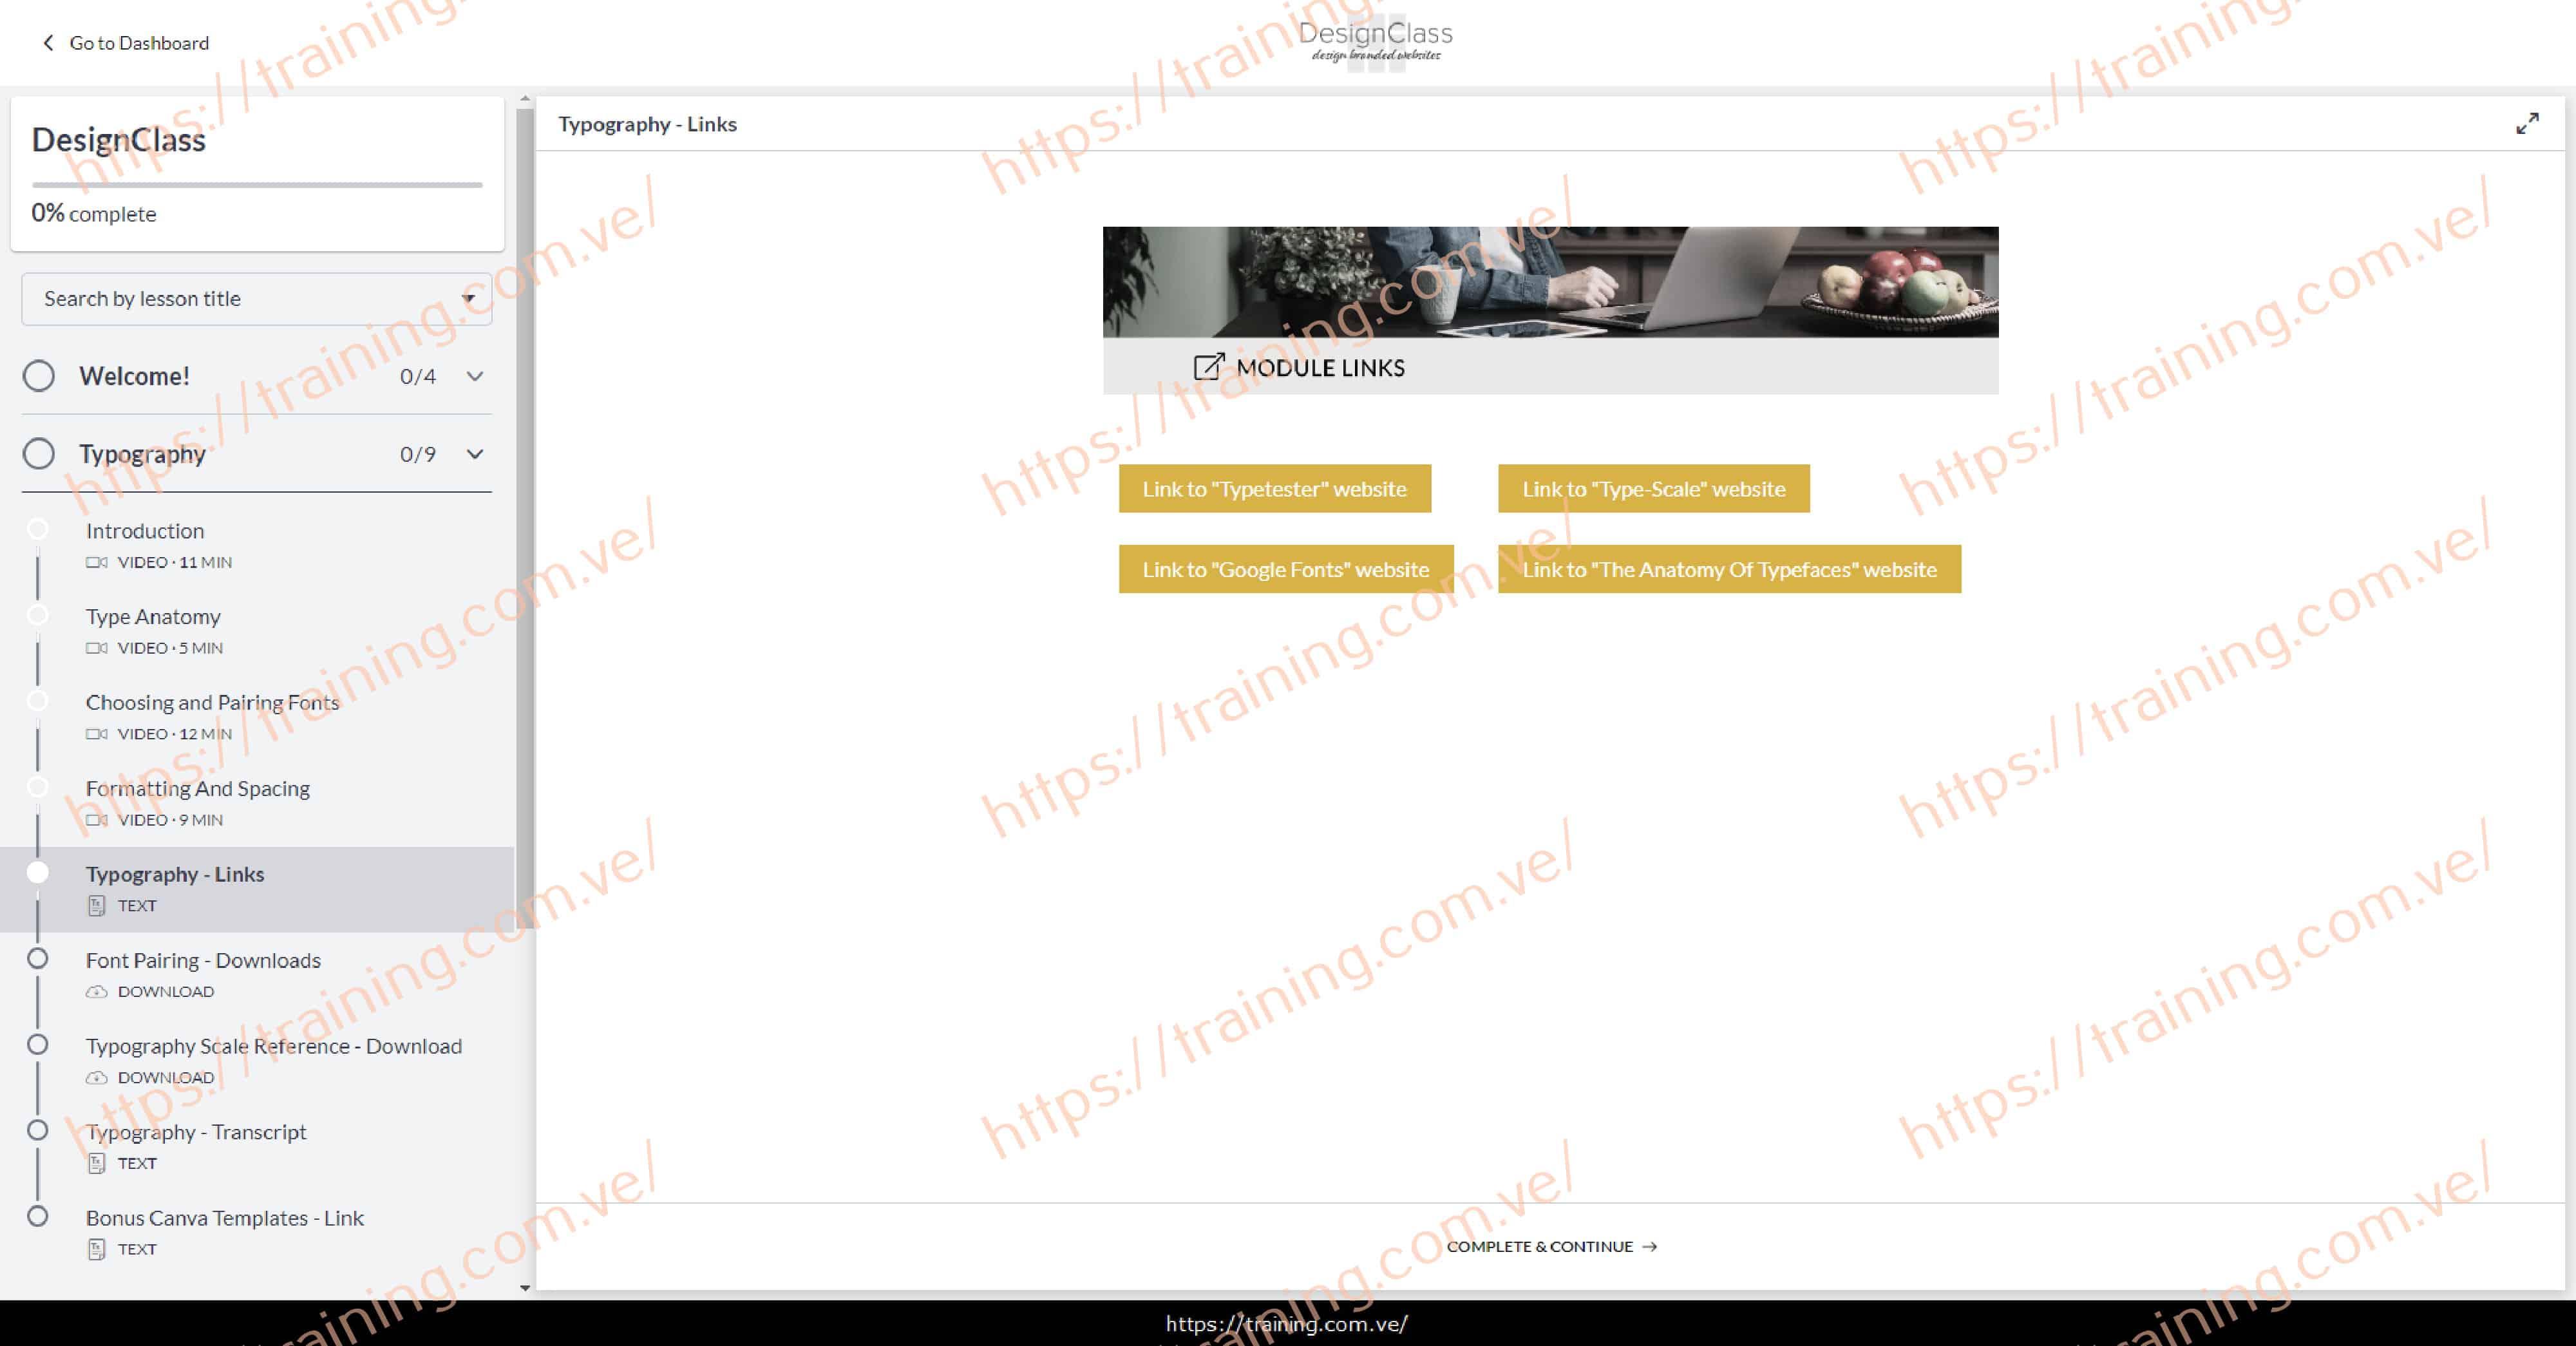 DesignClass by Mor Cohen Download